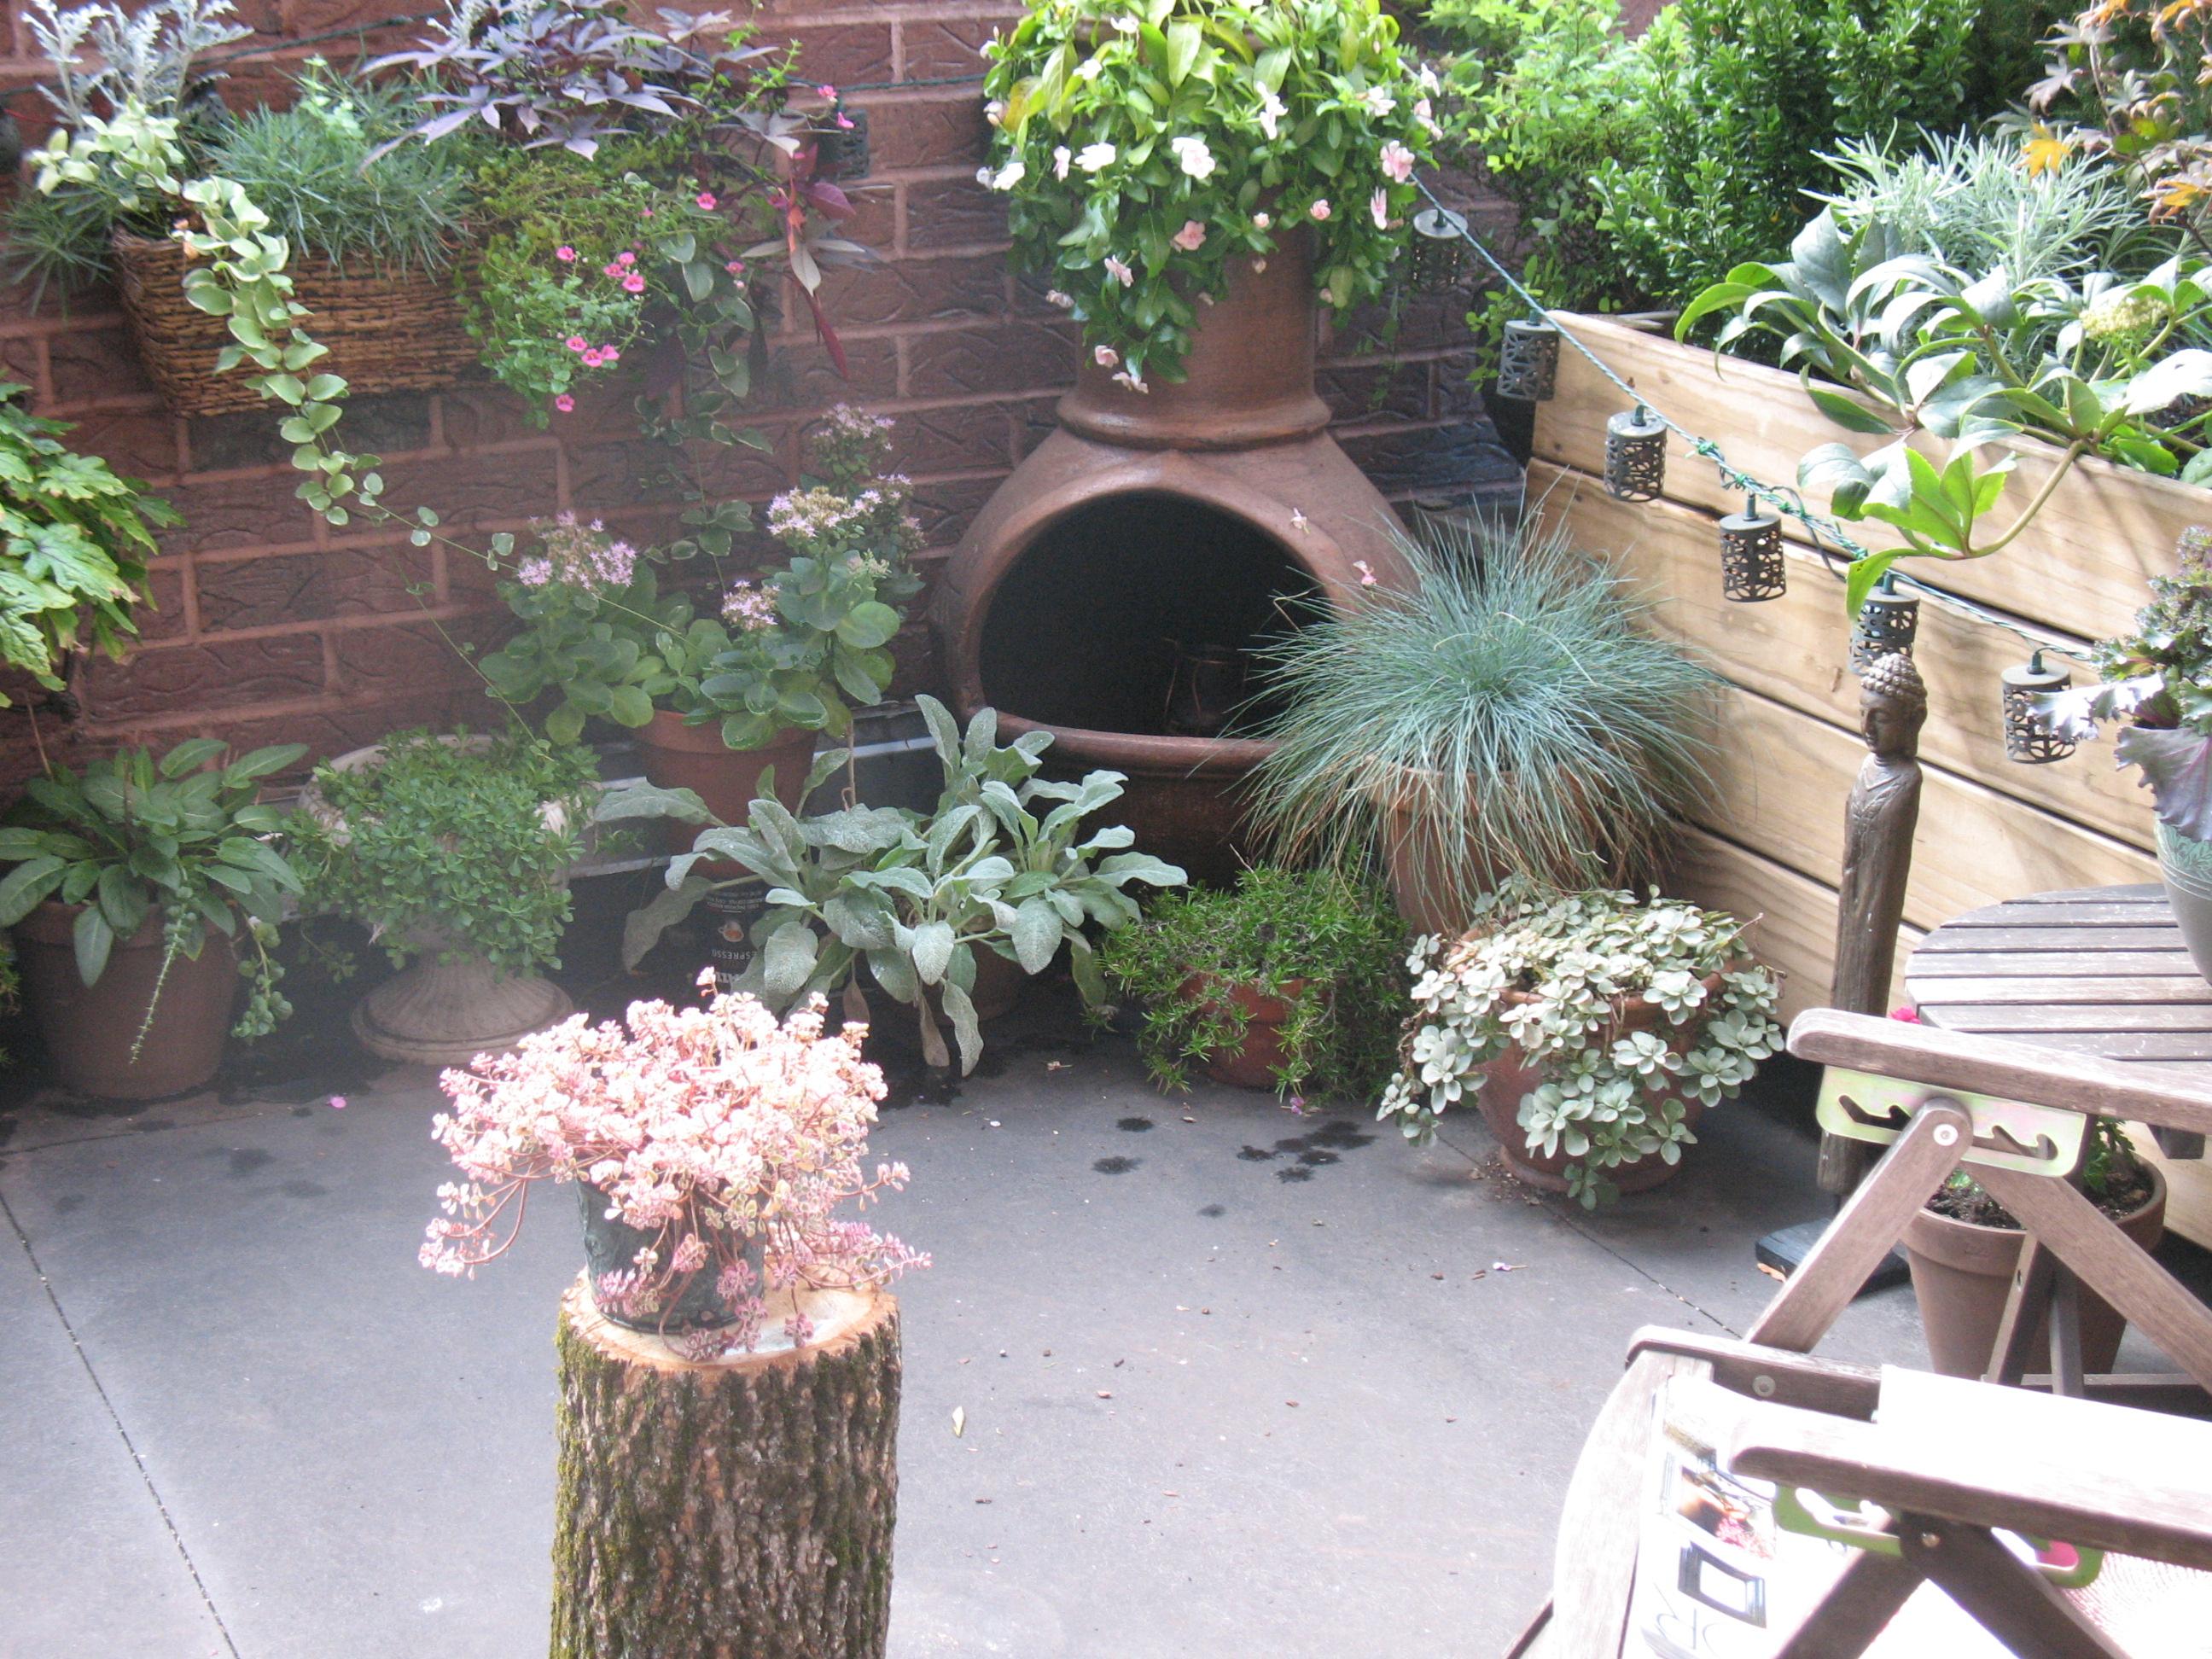 roof gardens amy christensen garden design like this